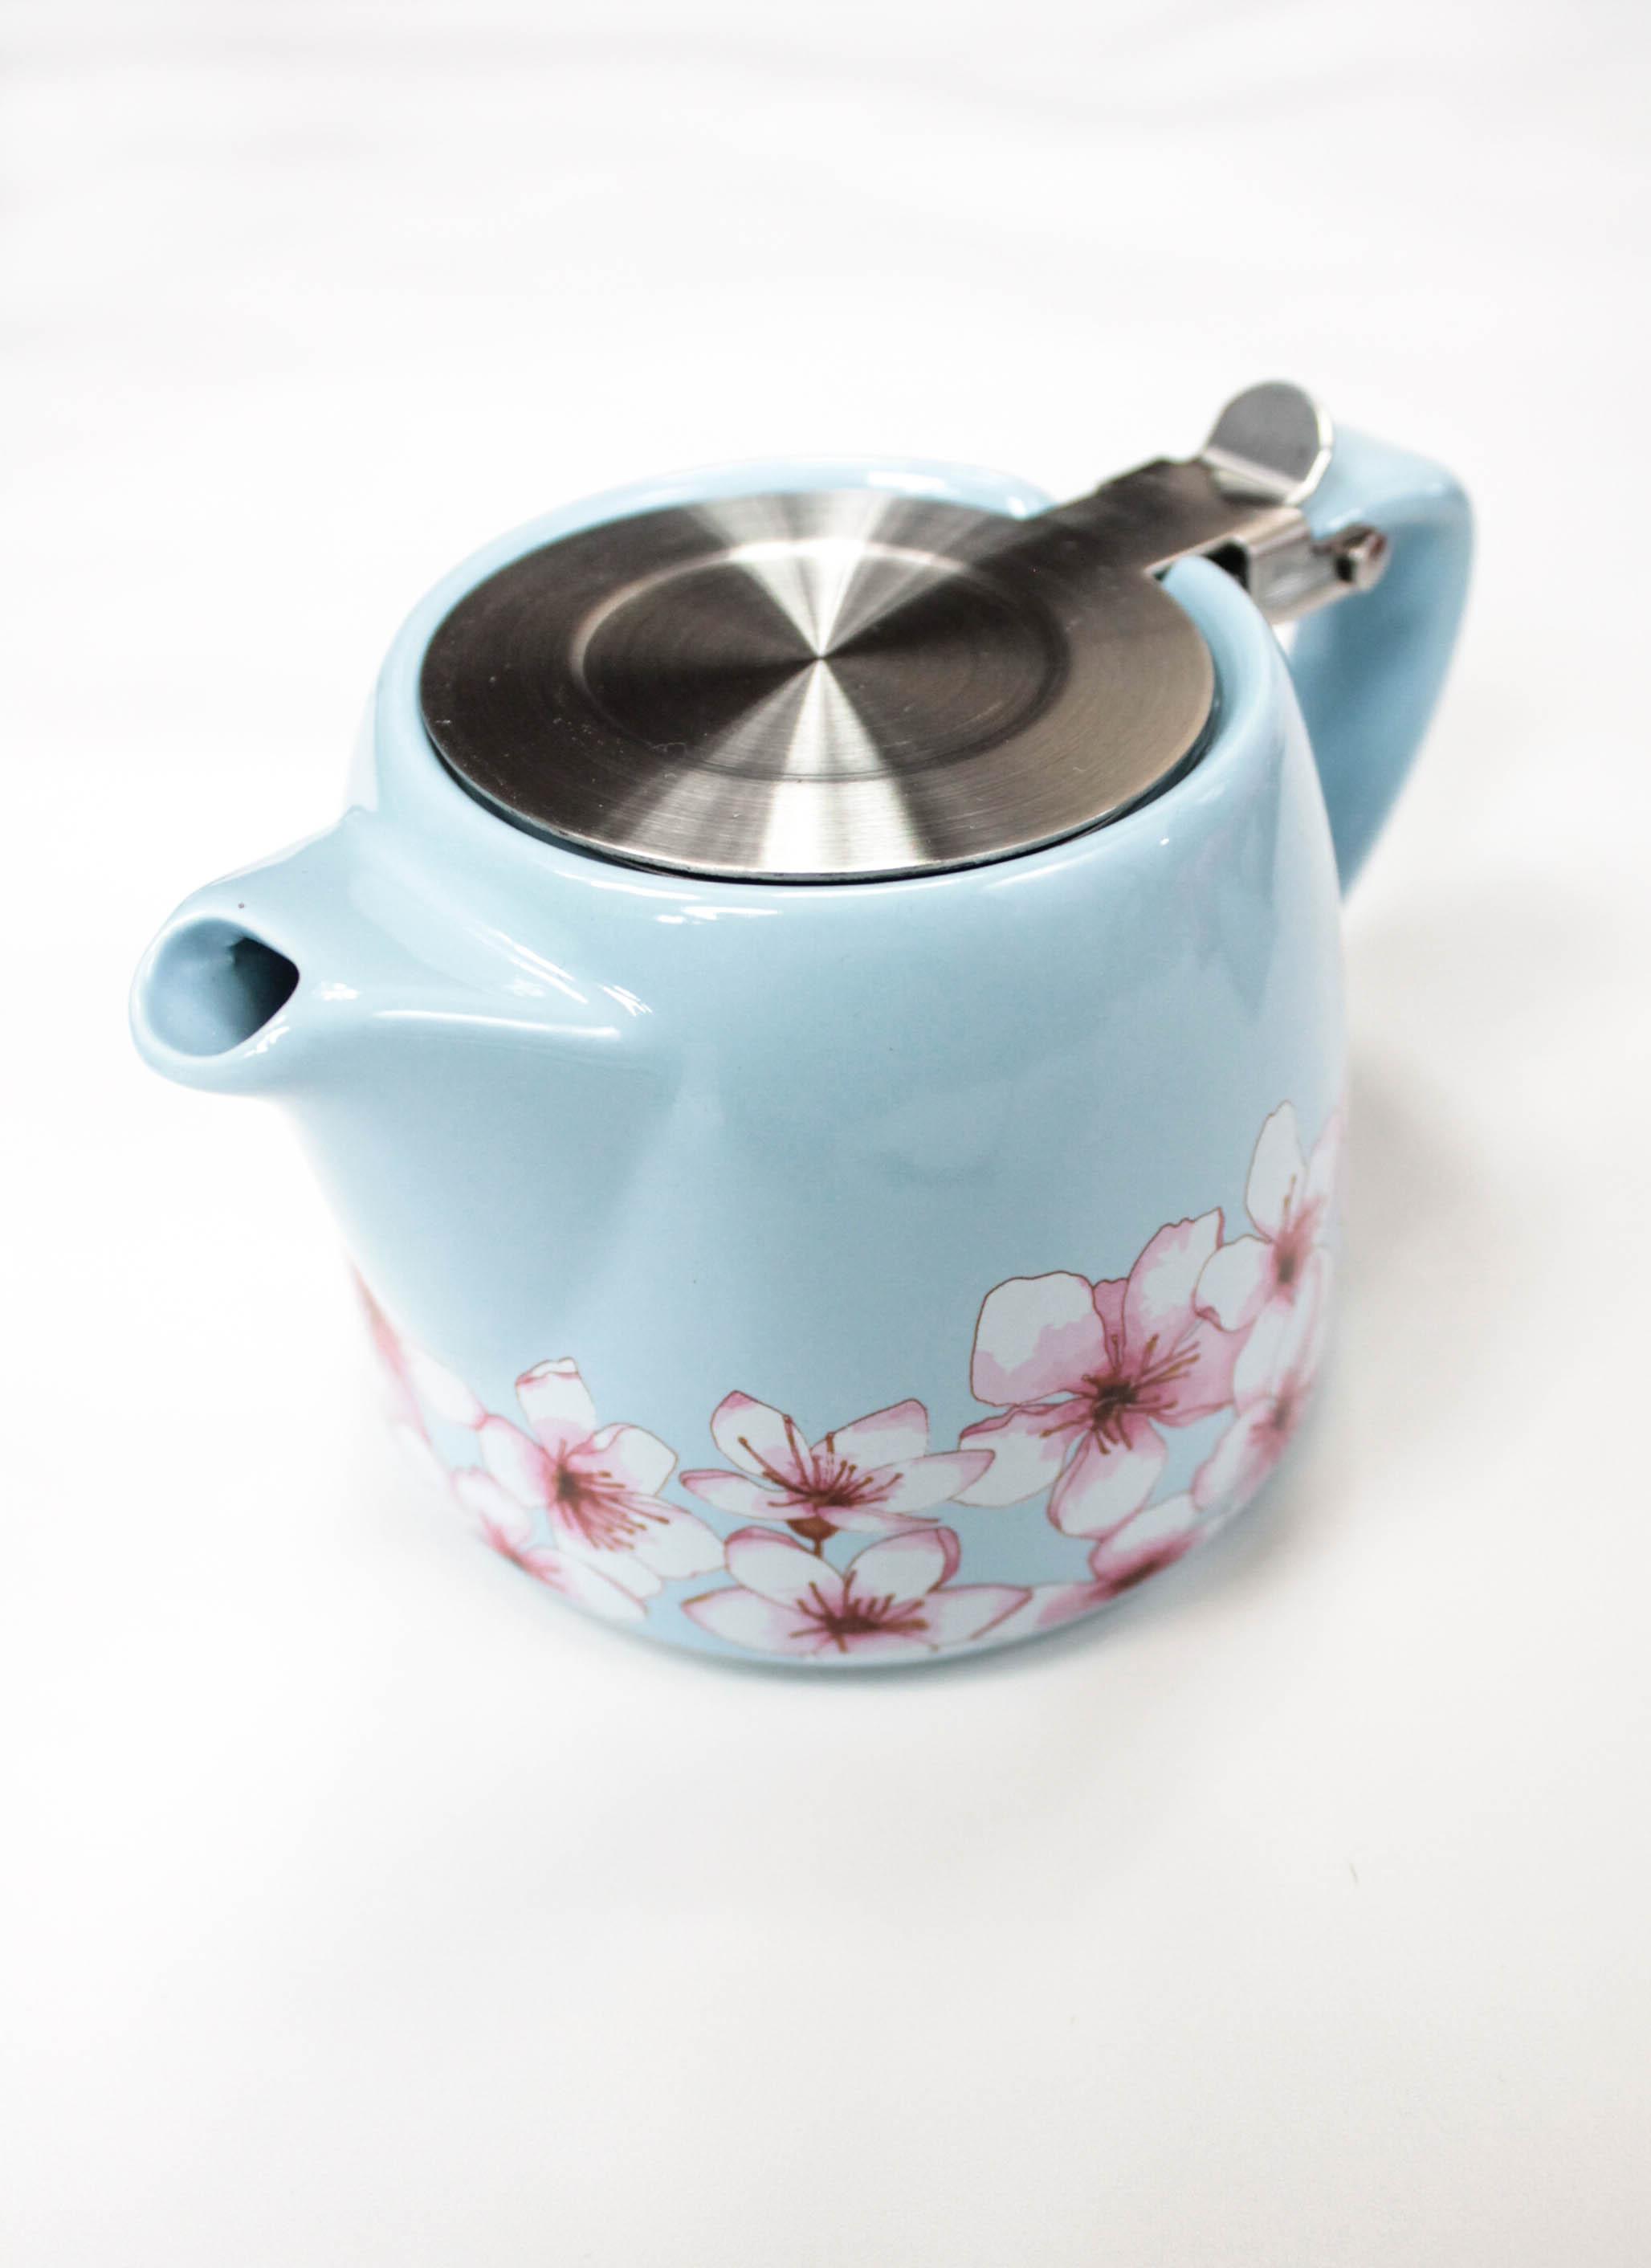 stainless steel ceramic teapot